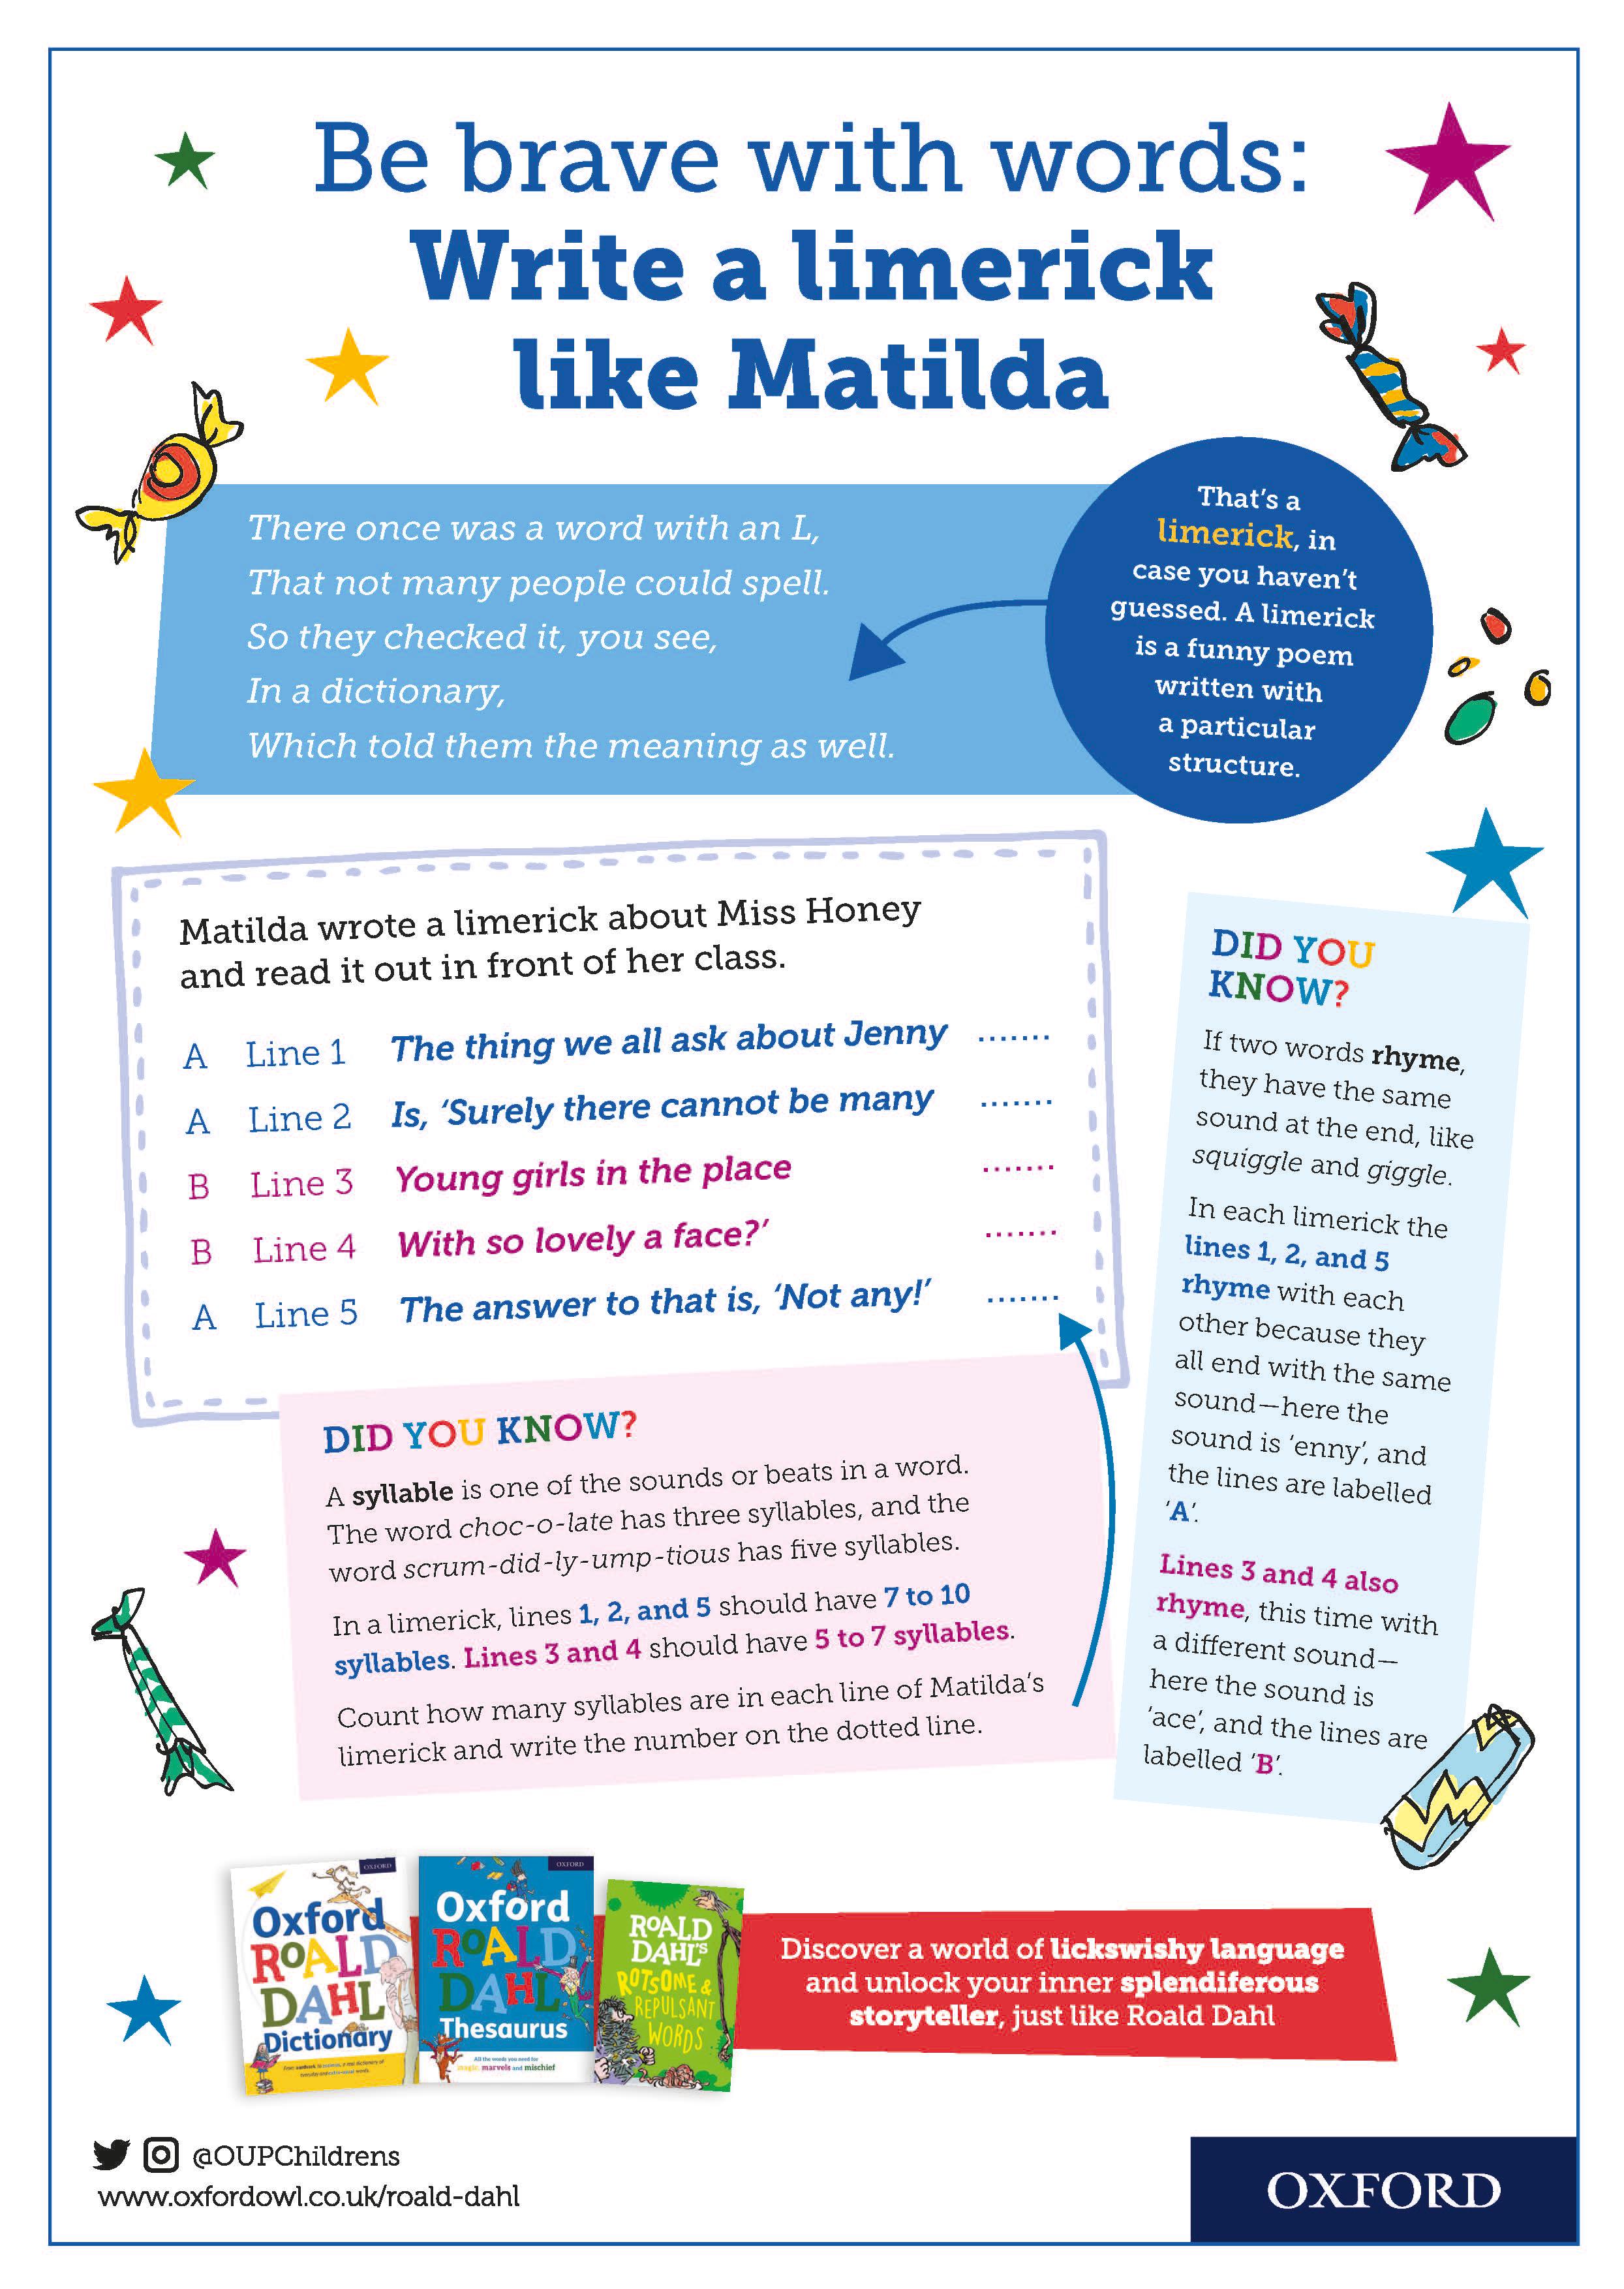 Master Limericks Like Matilda With This Fun And Helpful